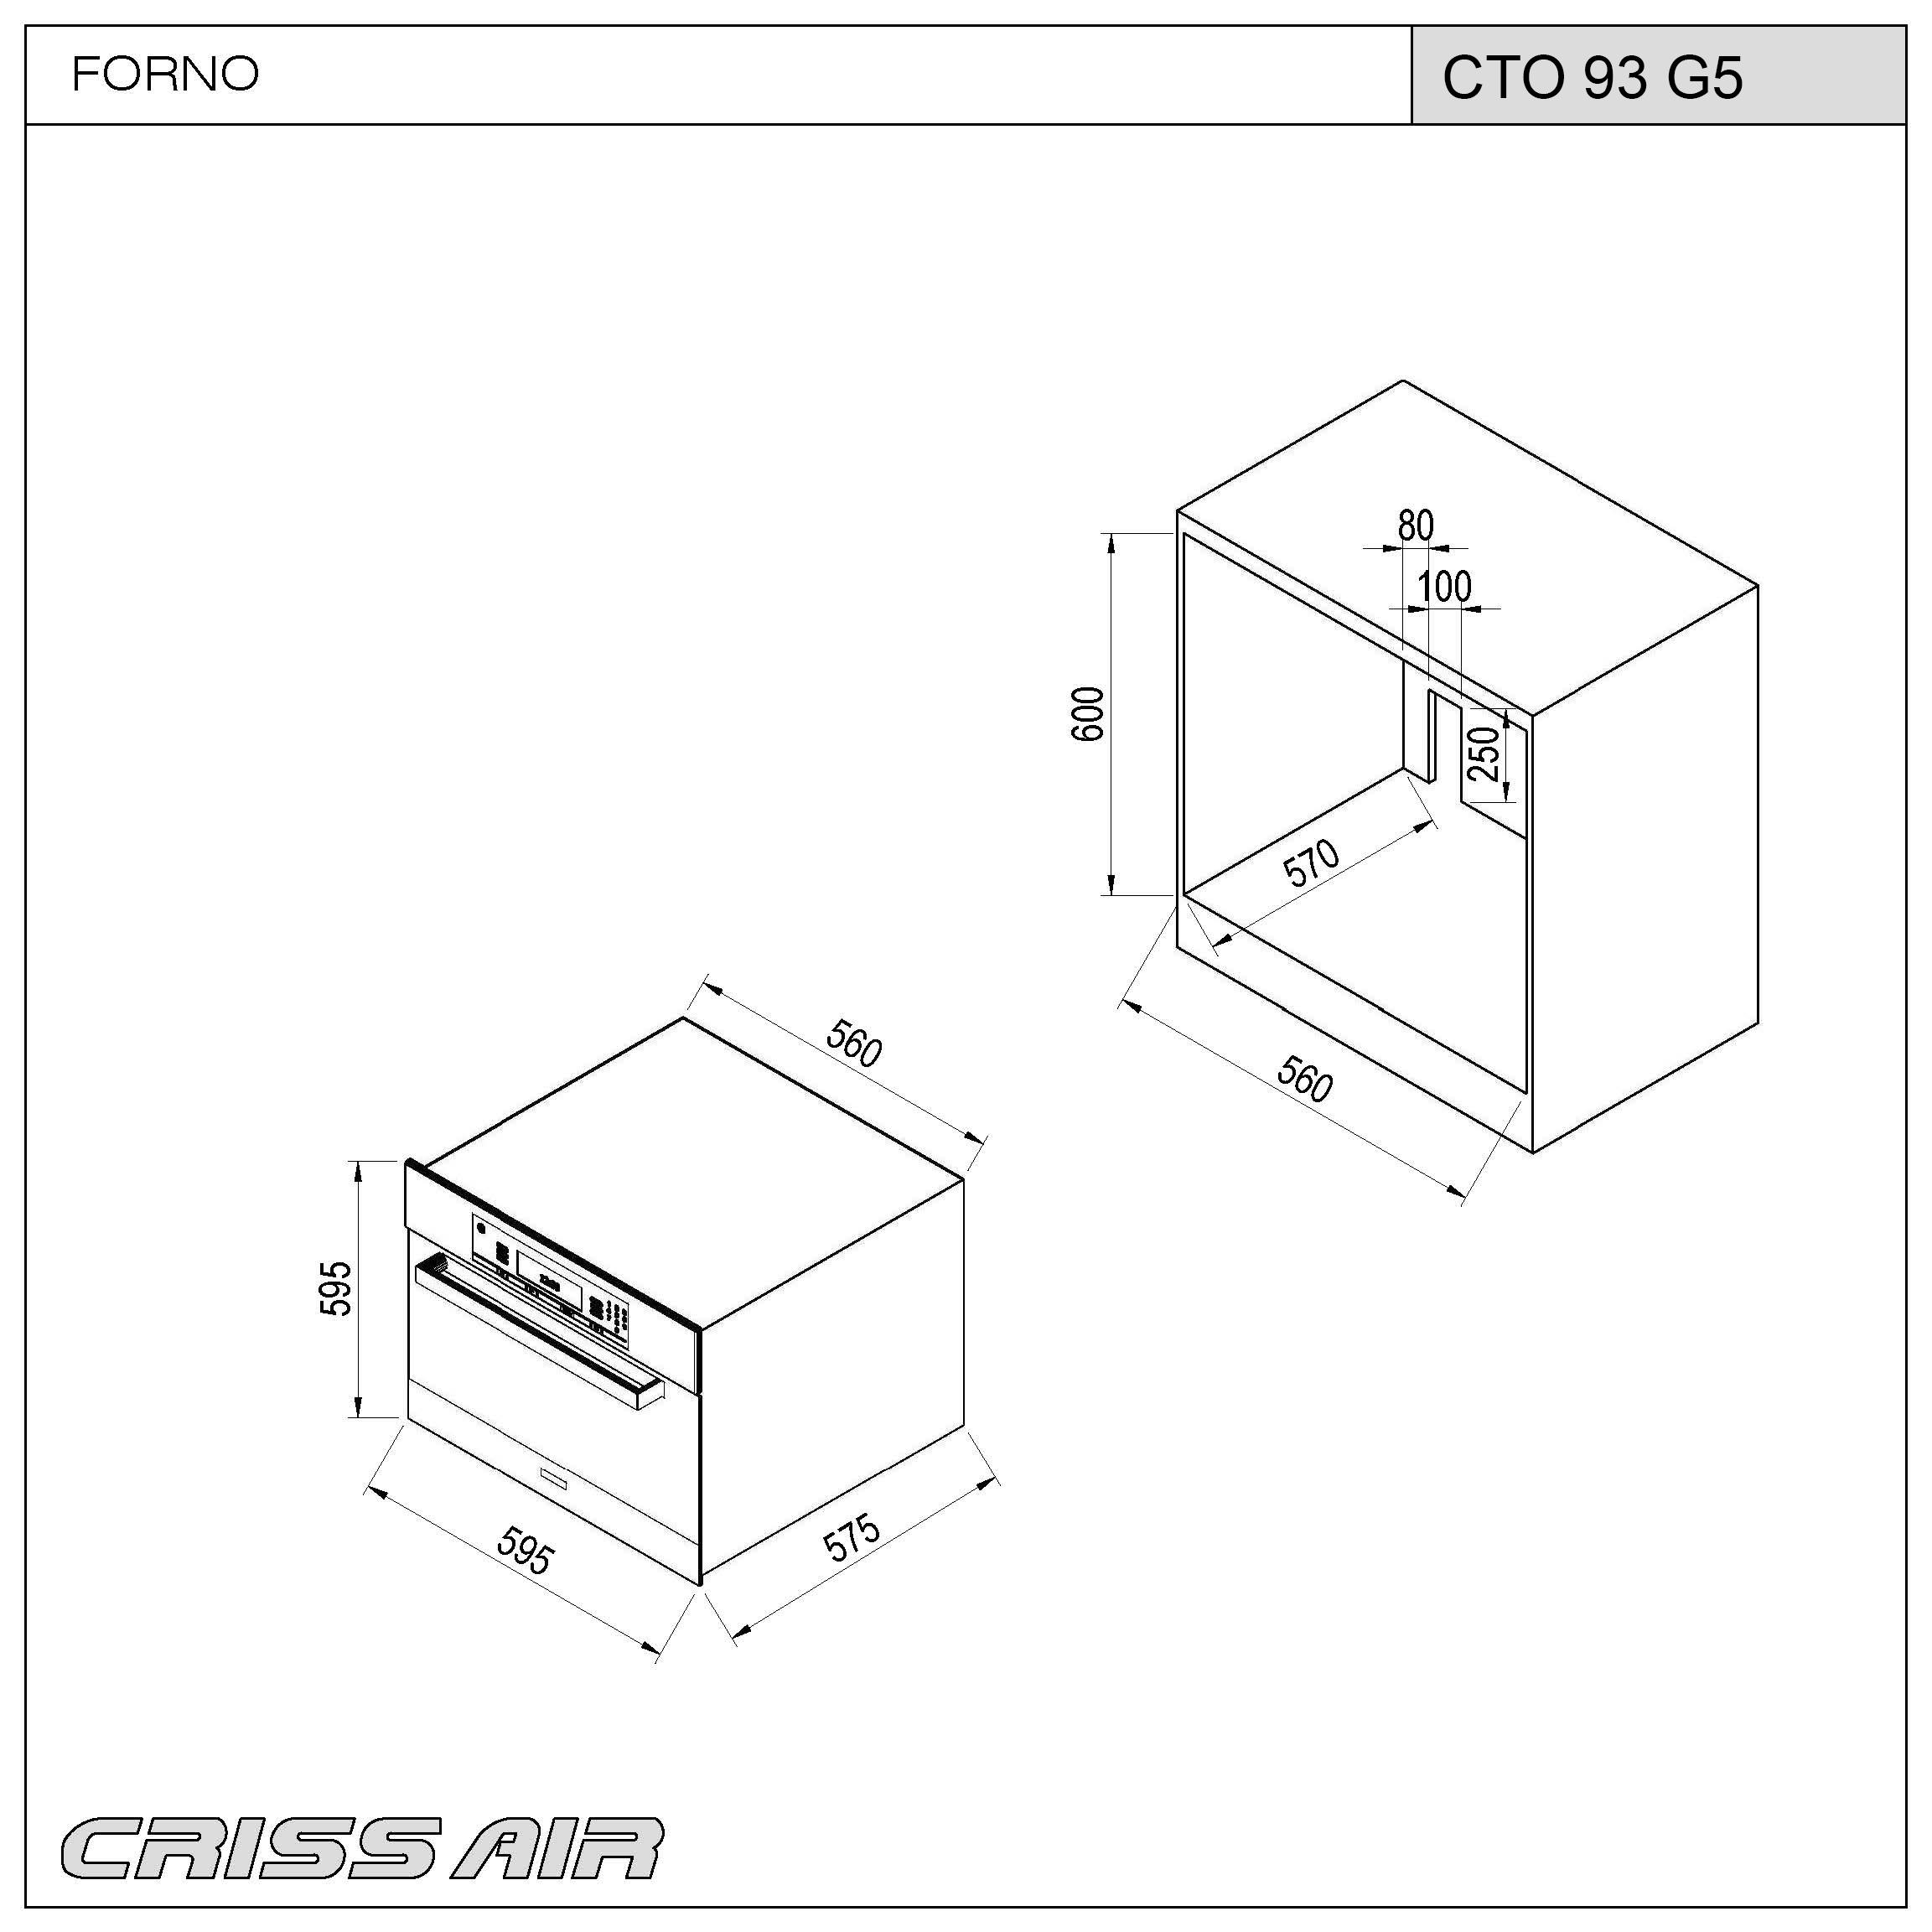 Forno Elétrico CTO 93 G5